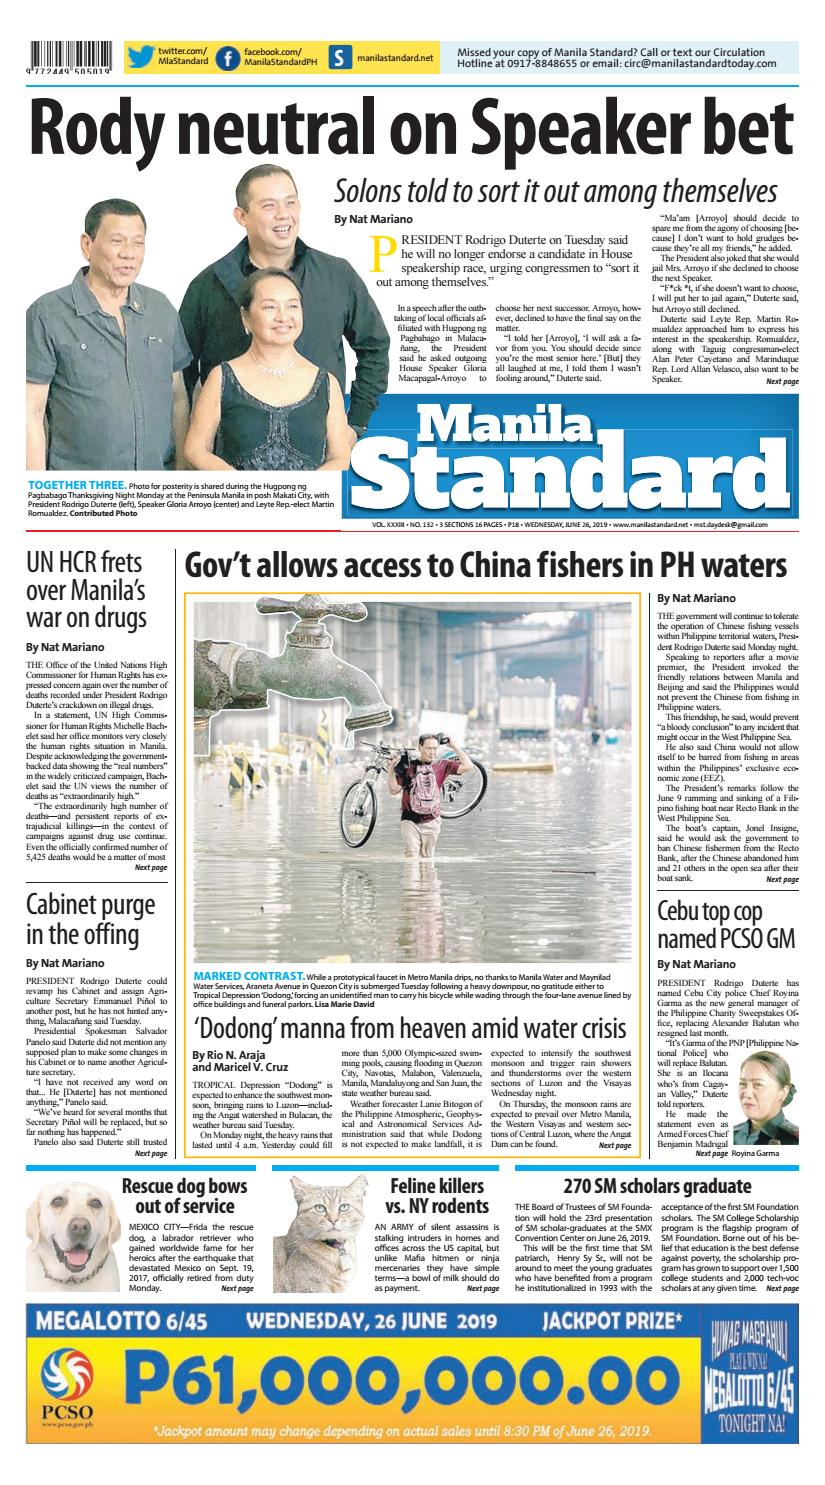 Manila Standard - 2019 June 26 - Wednesday by Manila Standard - issuu